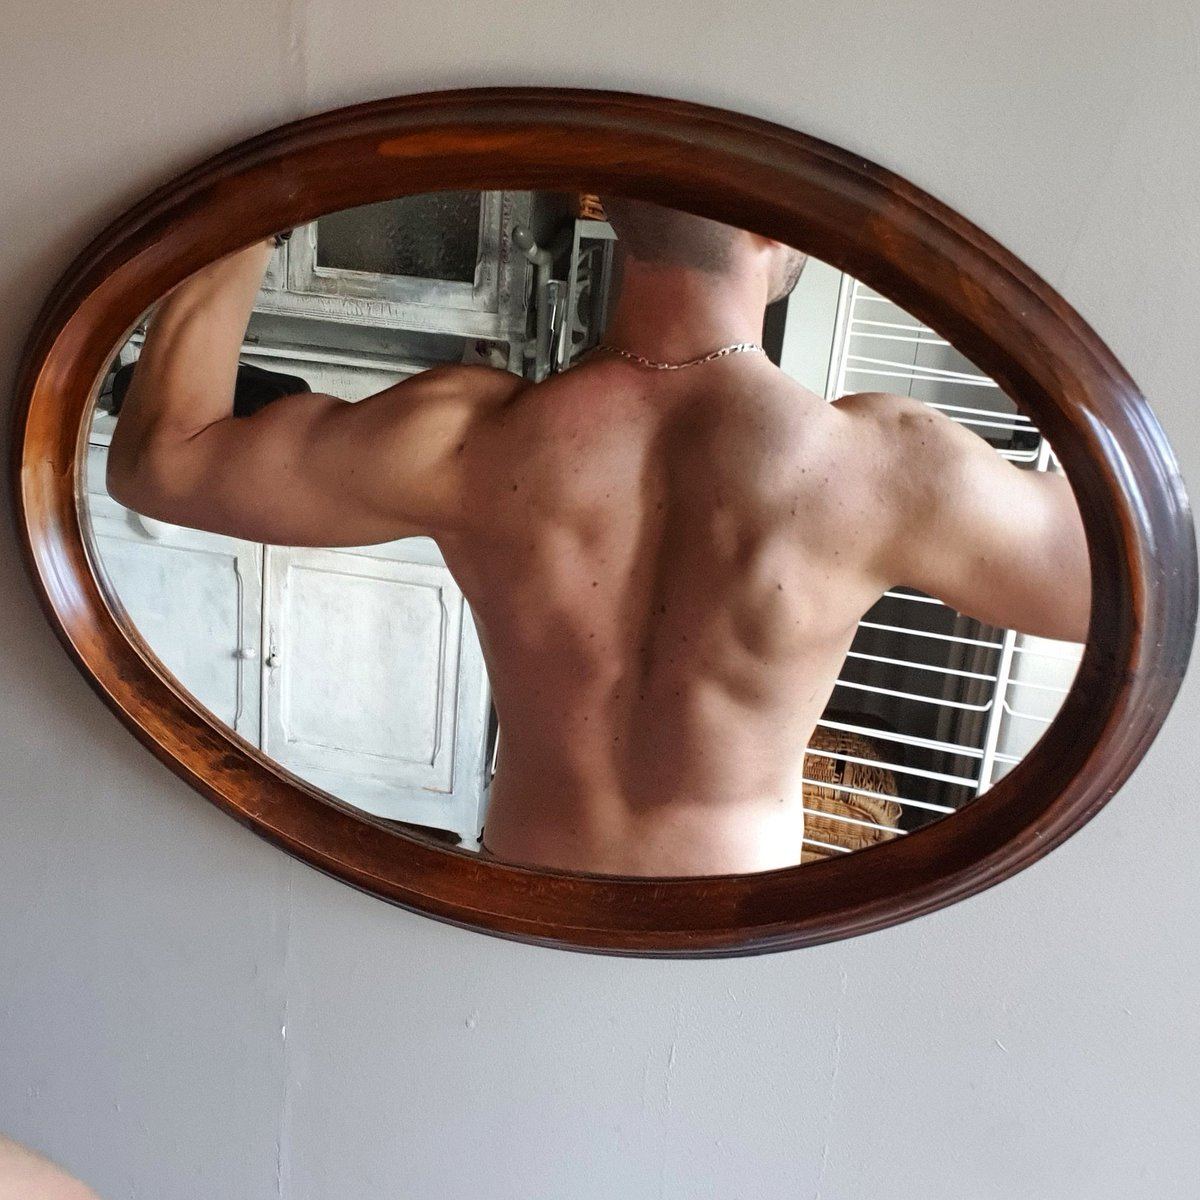 Back & Shoulders #sporttime #fitness #muscupic.twitter.com/H5i4WSAkRT